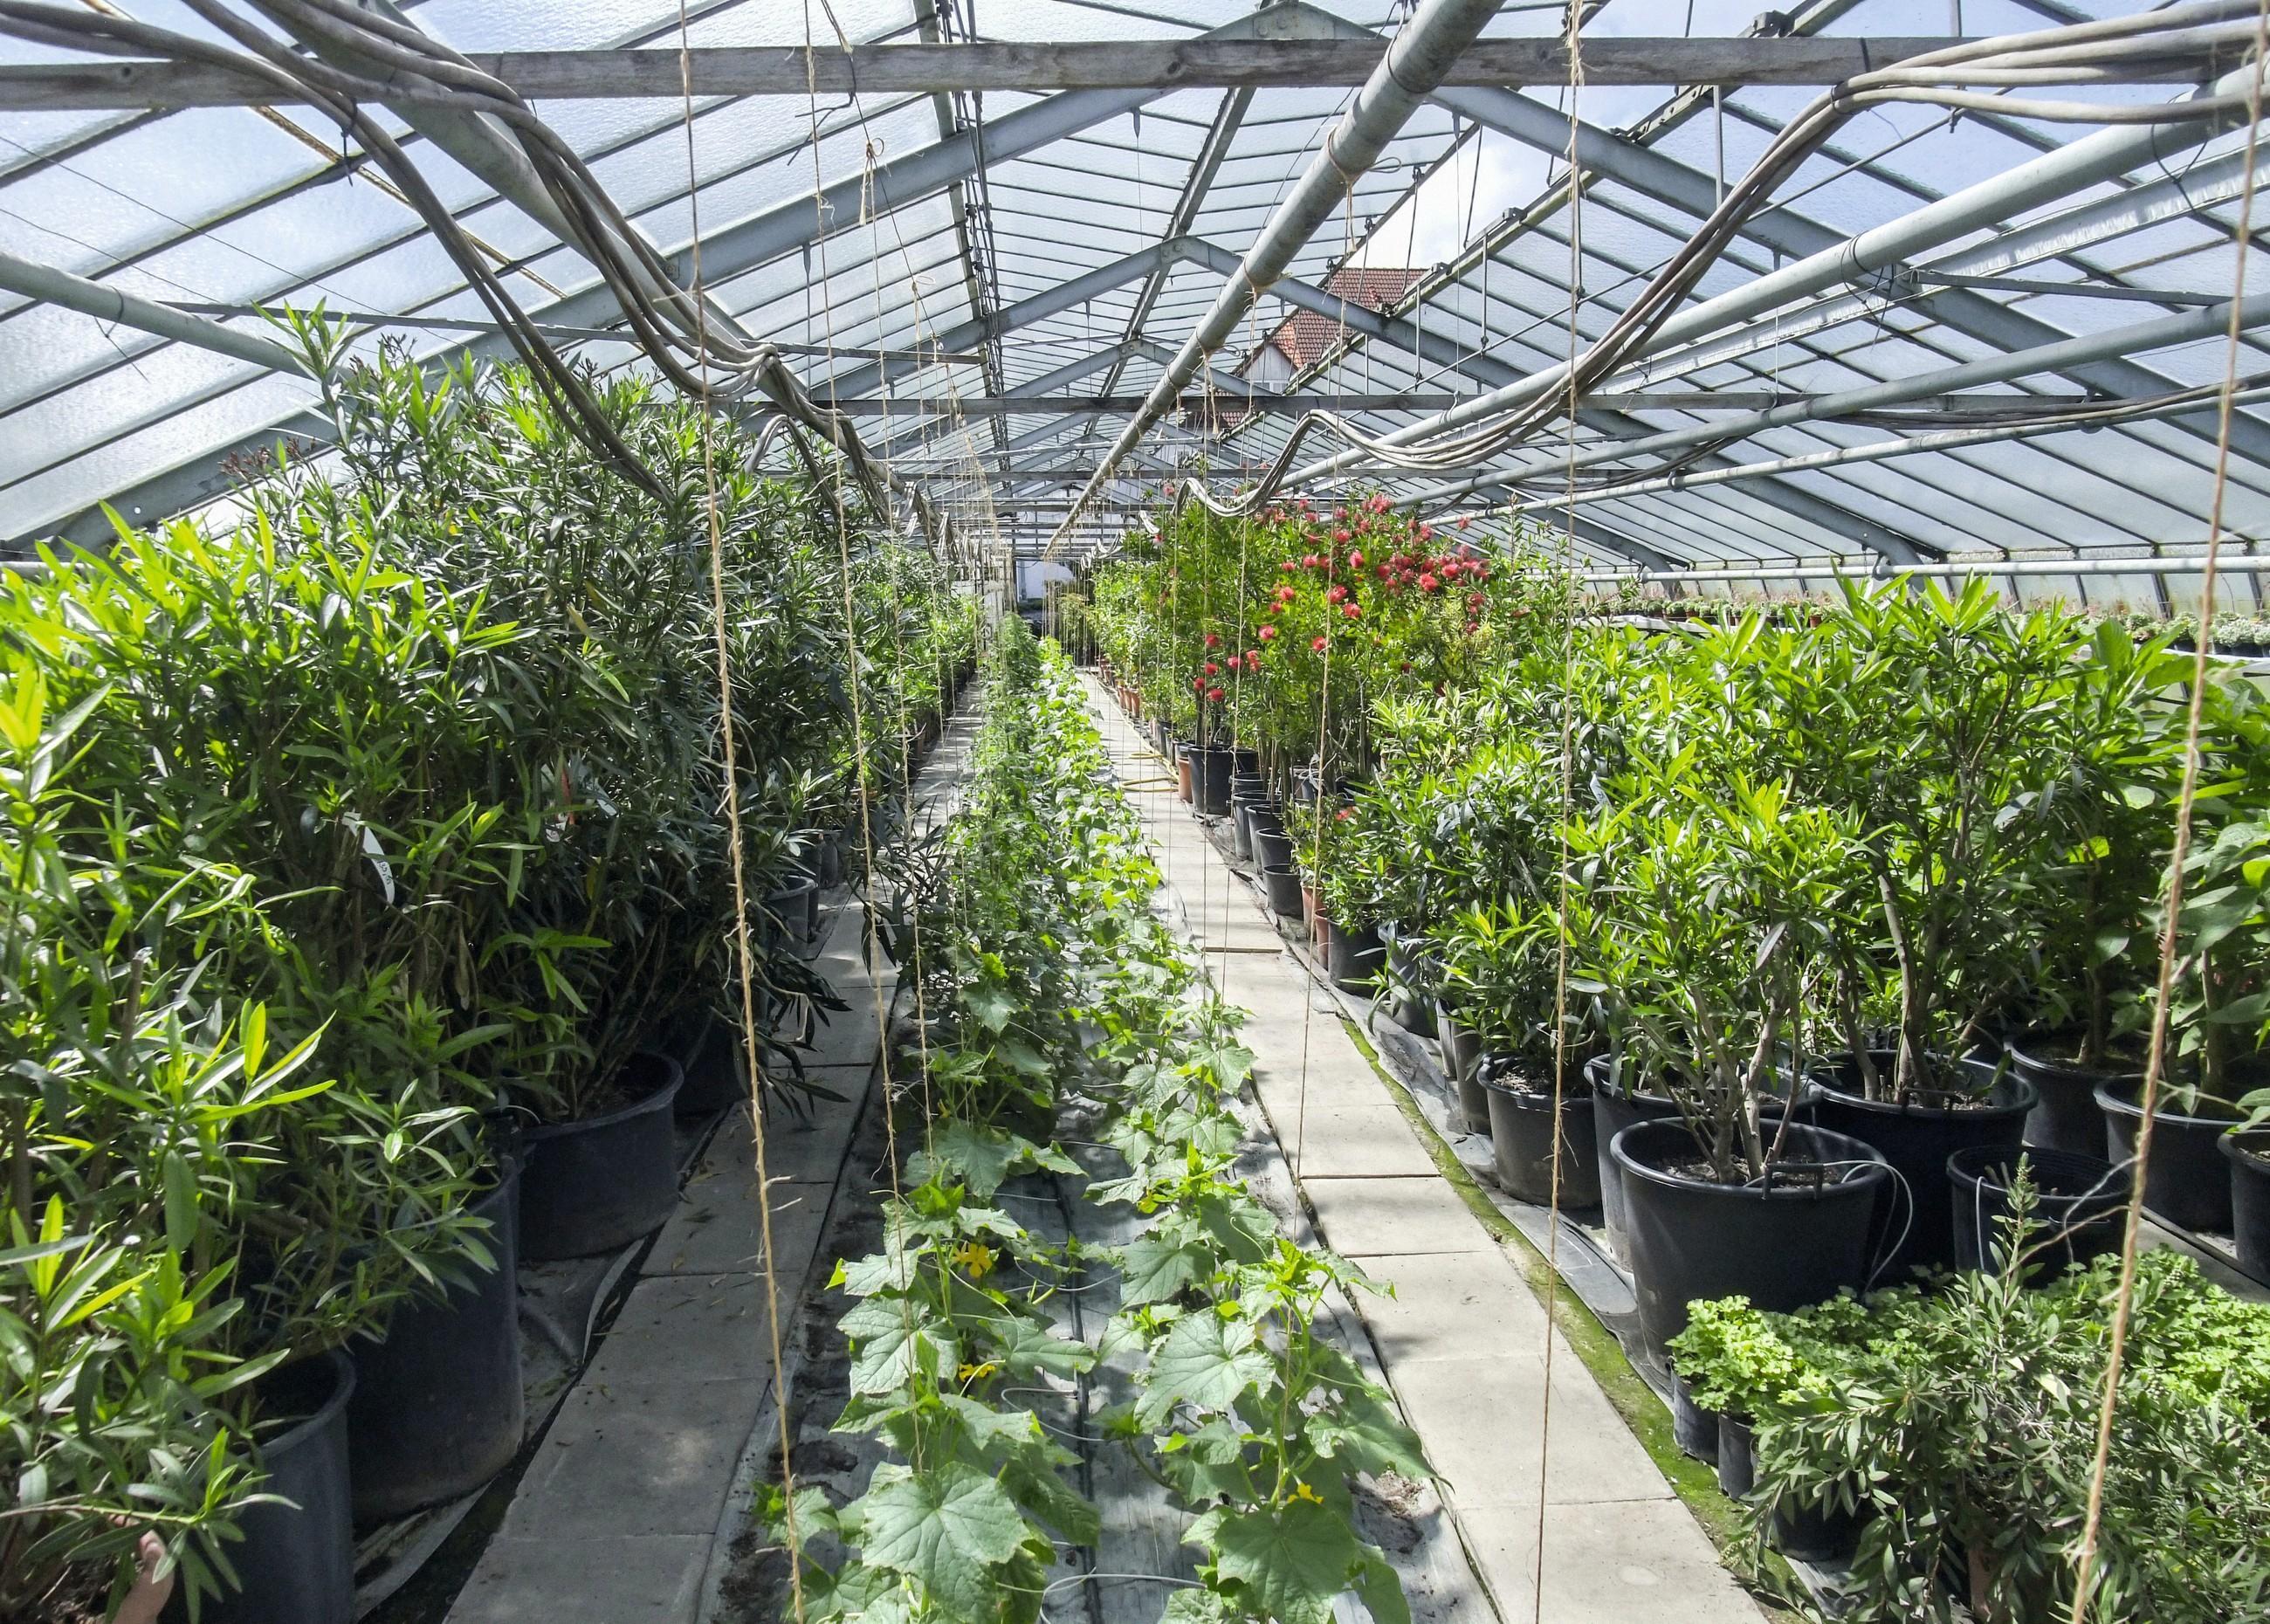 jardinerie - horticulteurs